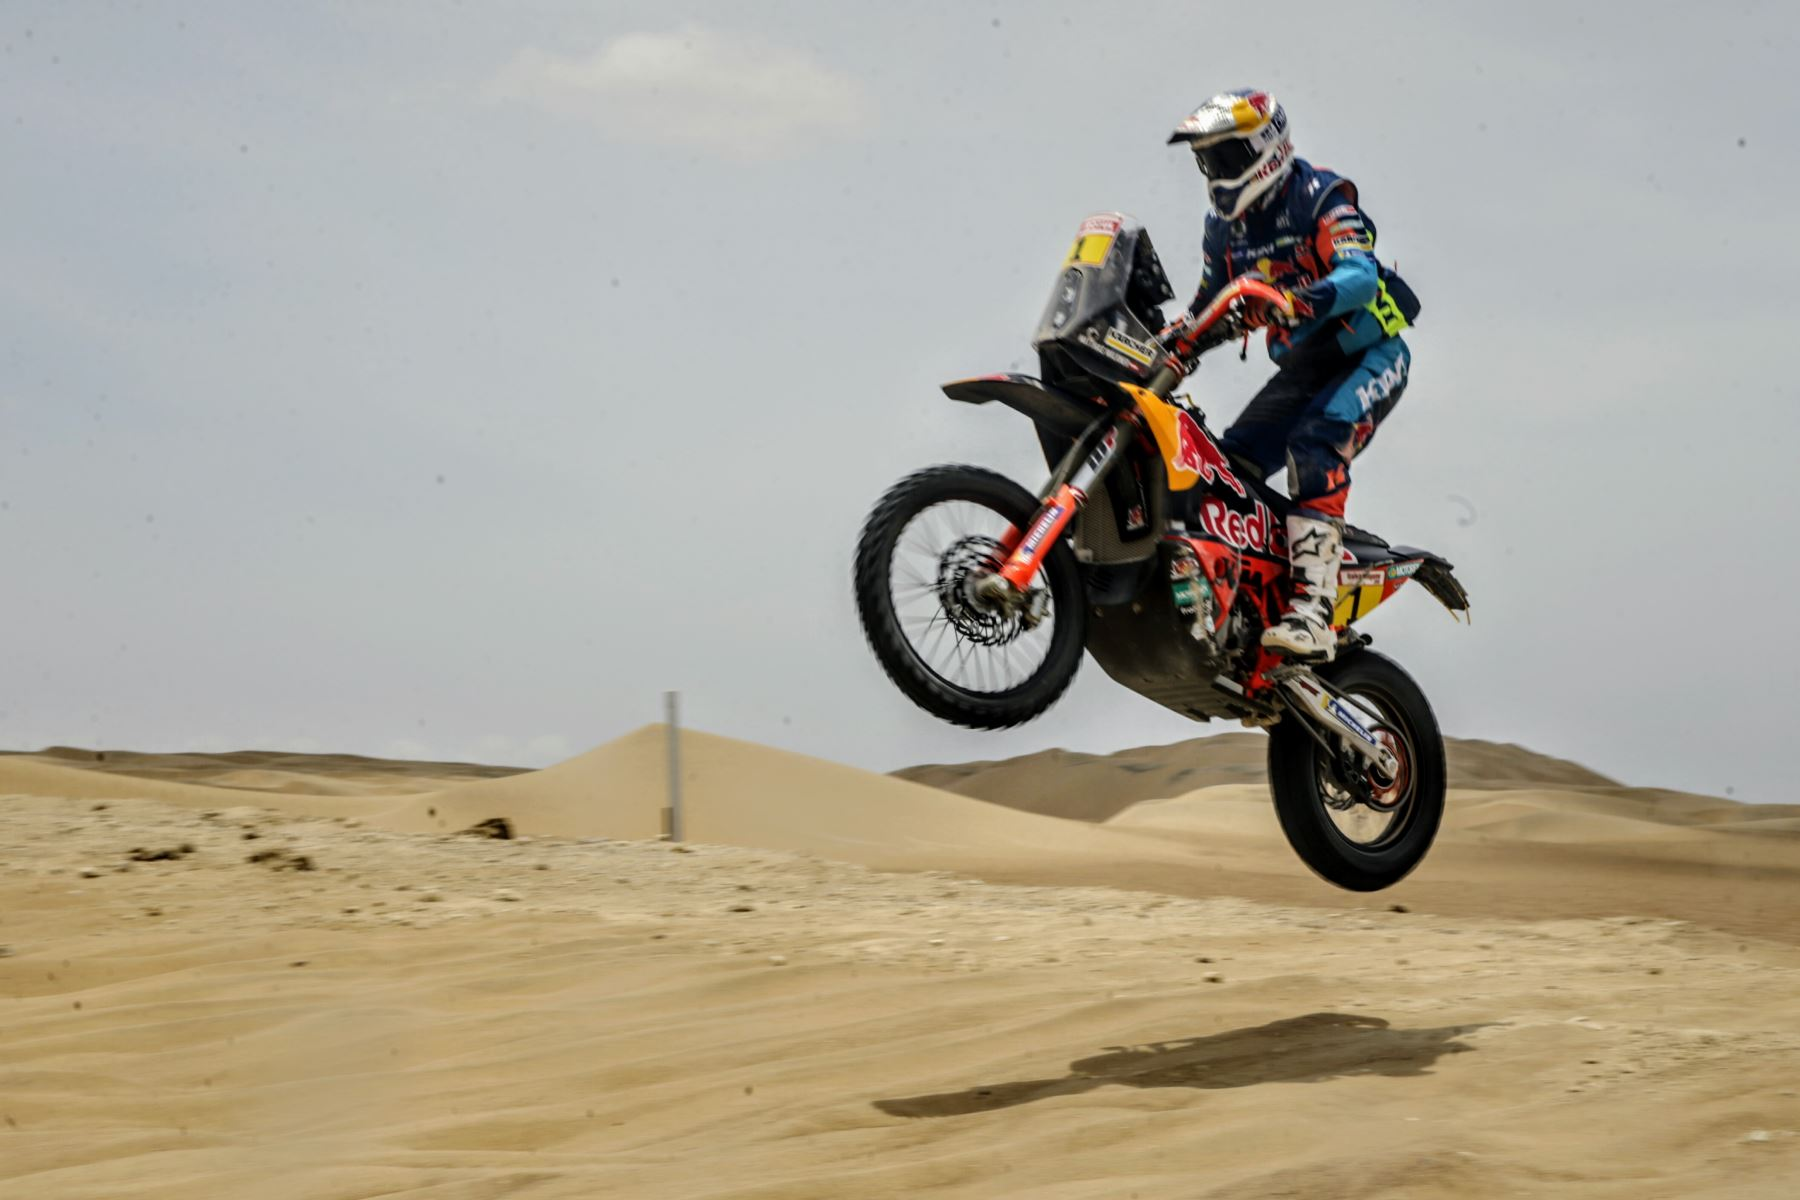 Segunda etapa de la ruta San Juan de Marcona del Rally Dakar 2019. Foto: ANDINA/Luis Iparraguirre